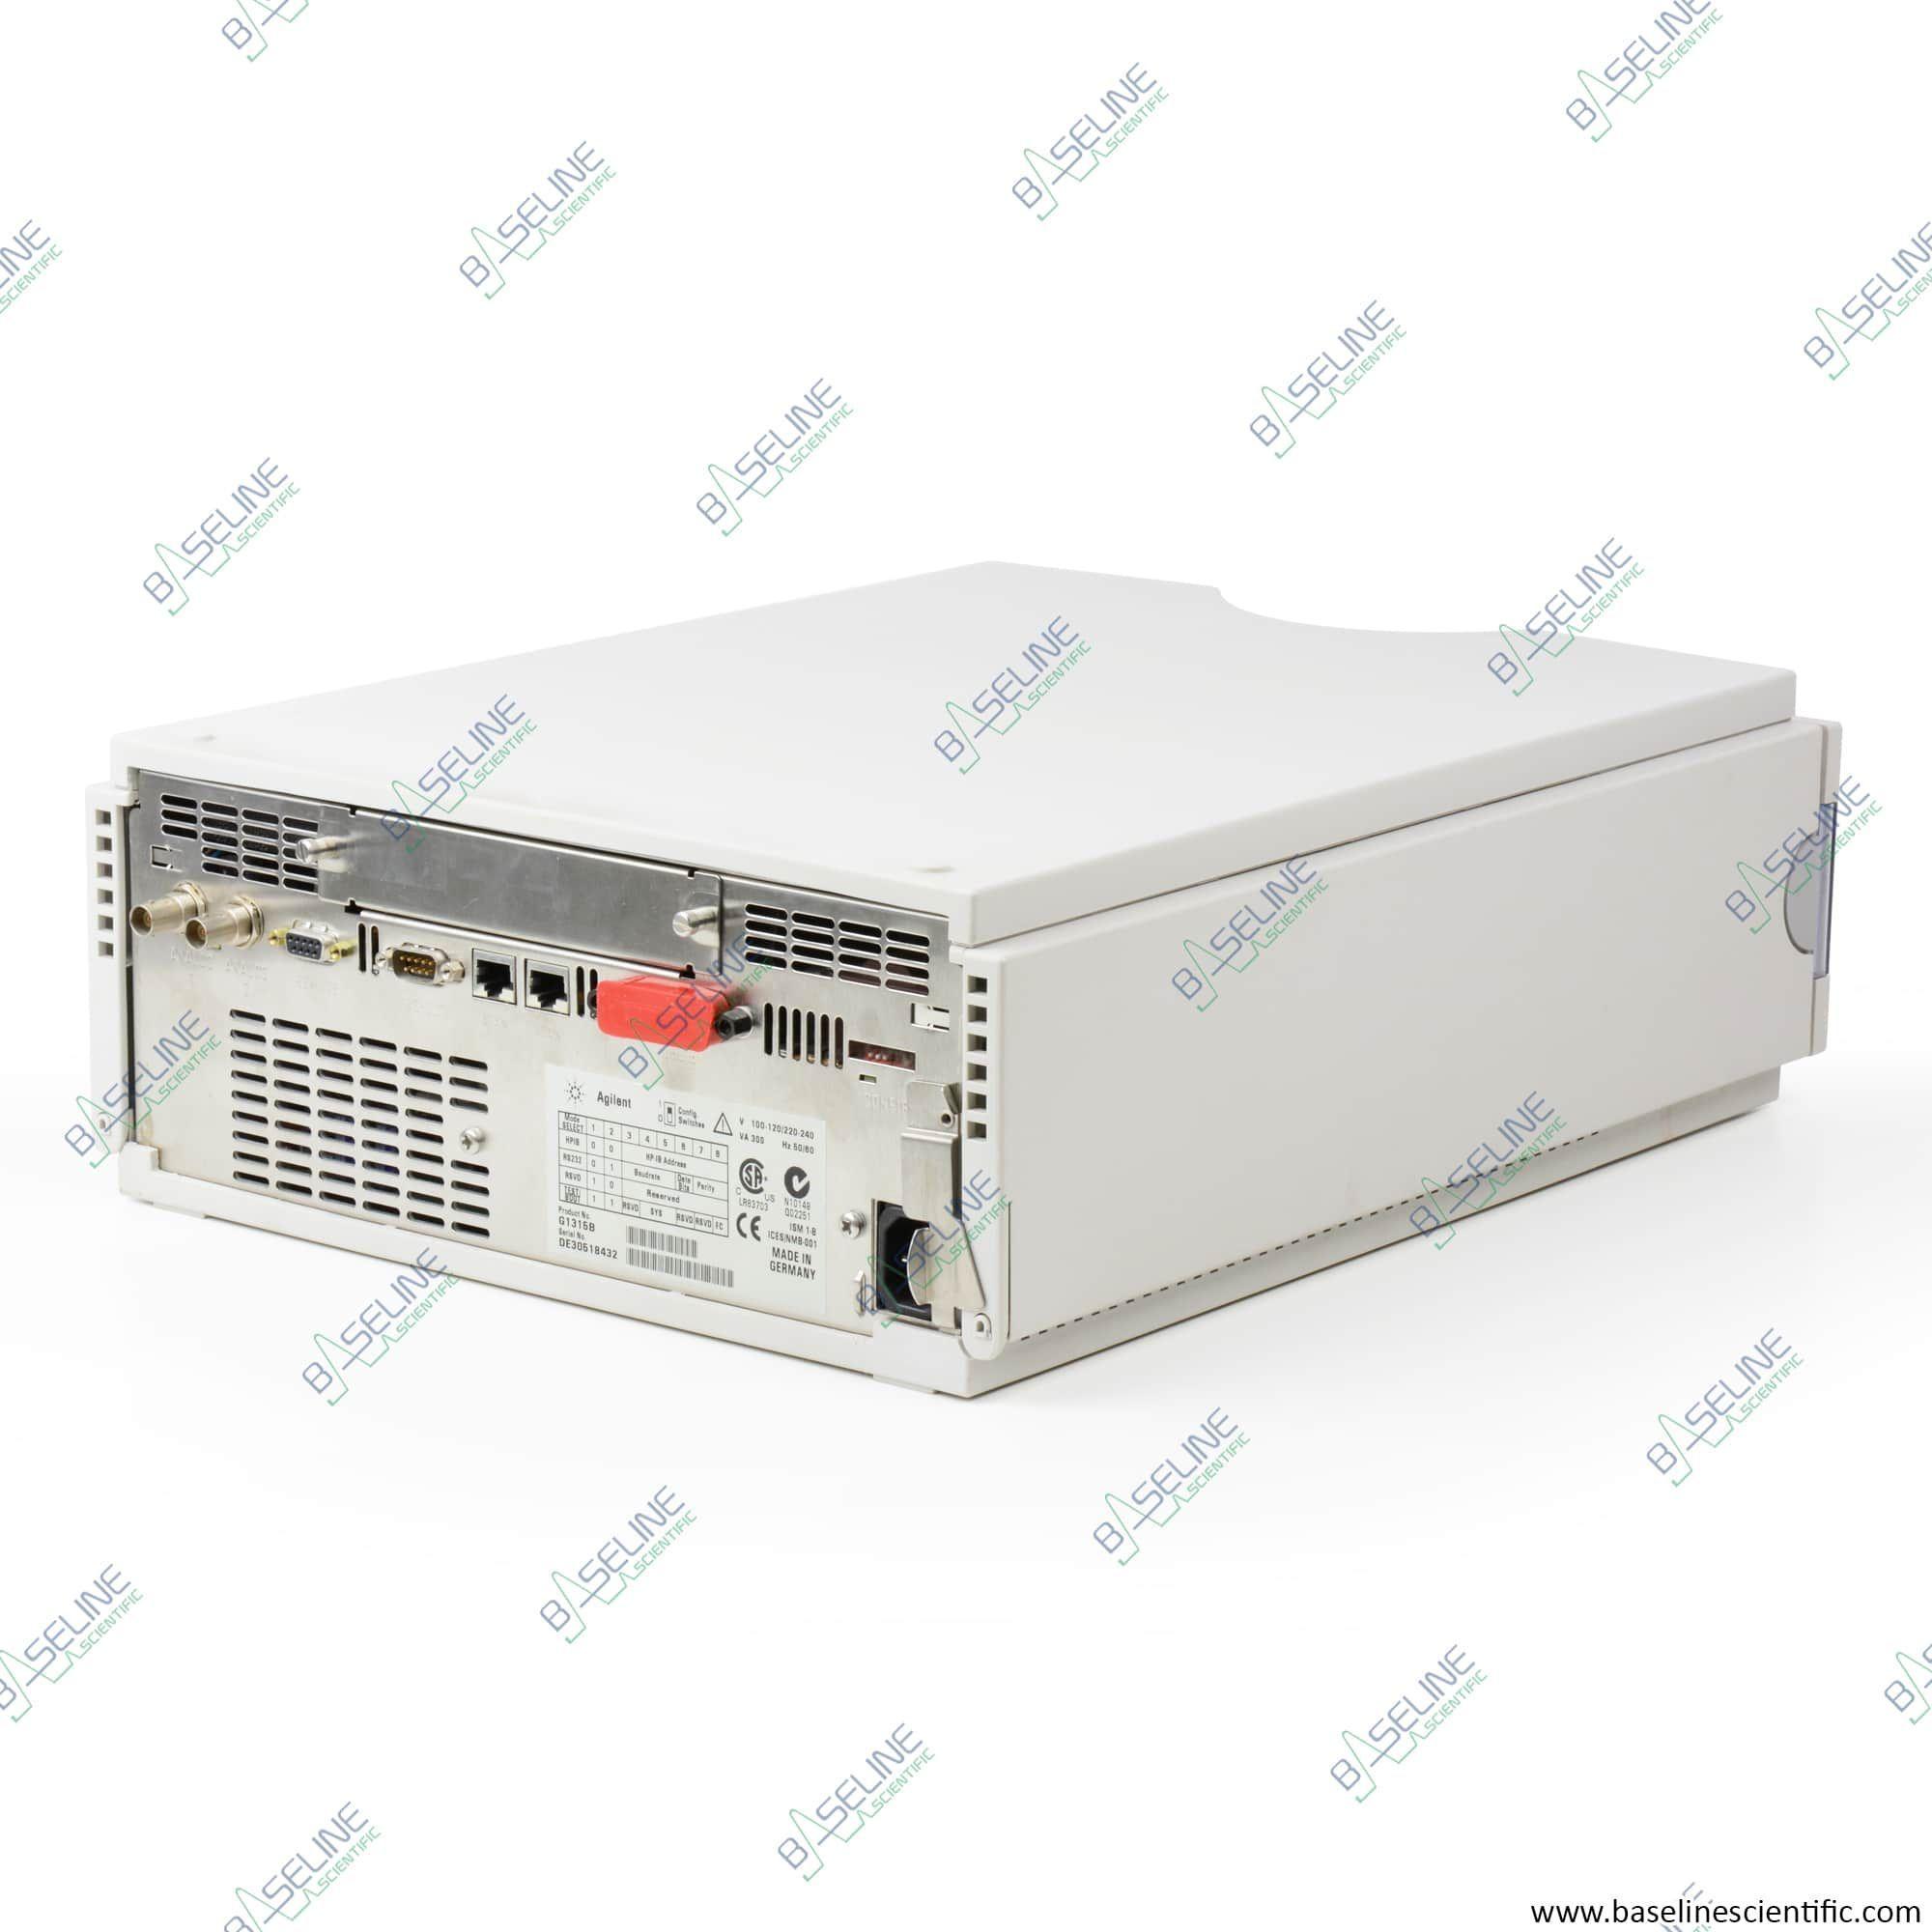 Refurbished Agilent/HP 1100 G1315B Detector with ONE YEAR WARRANTY